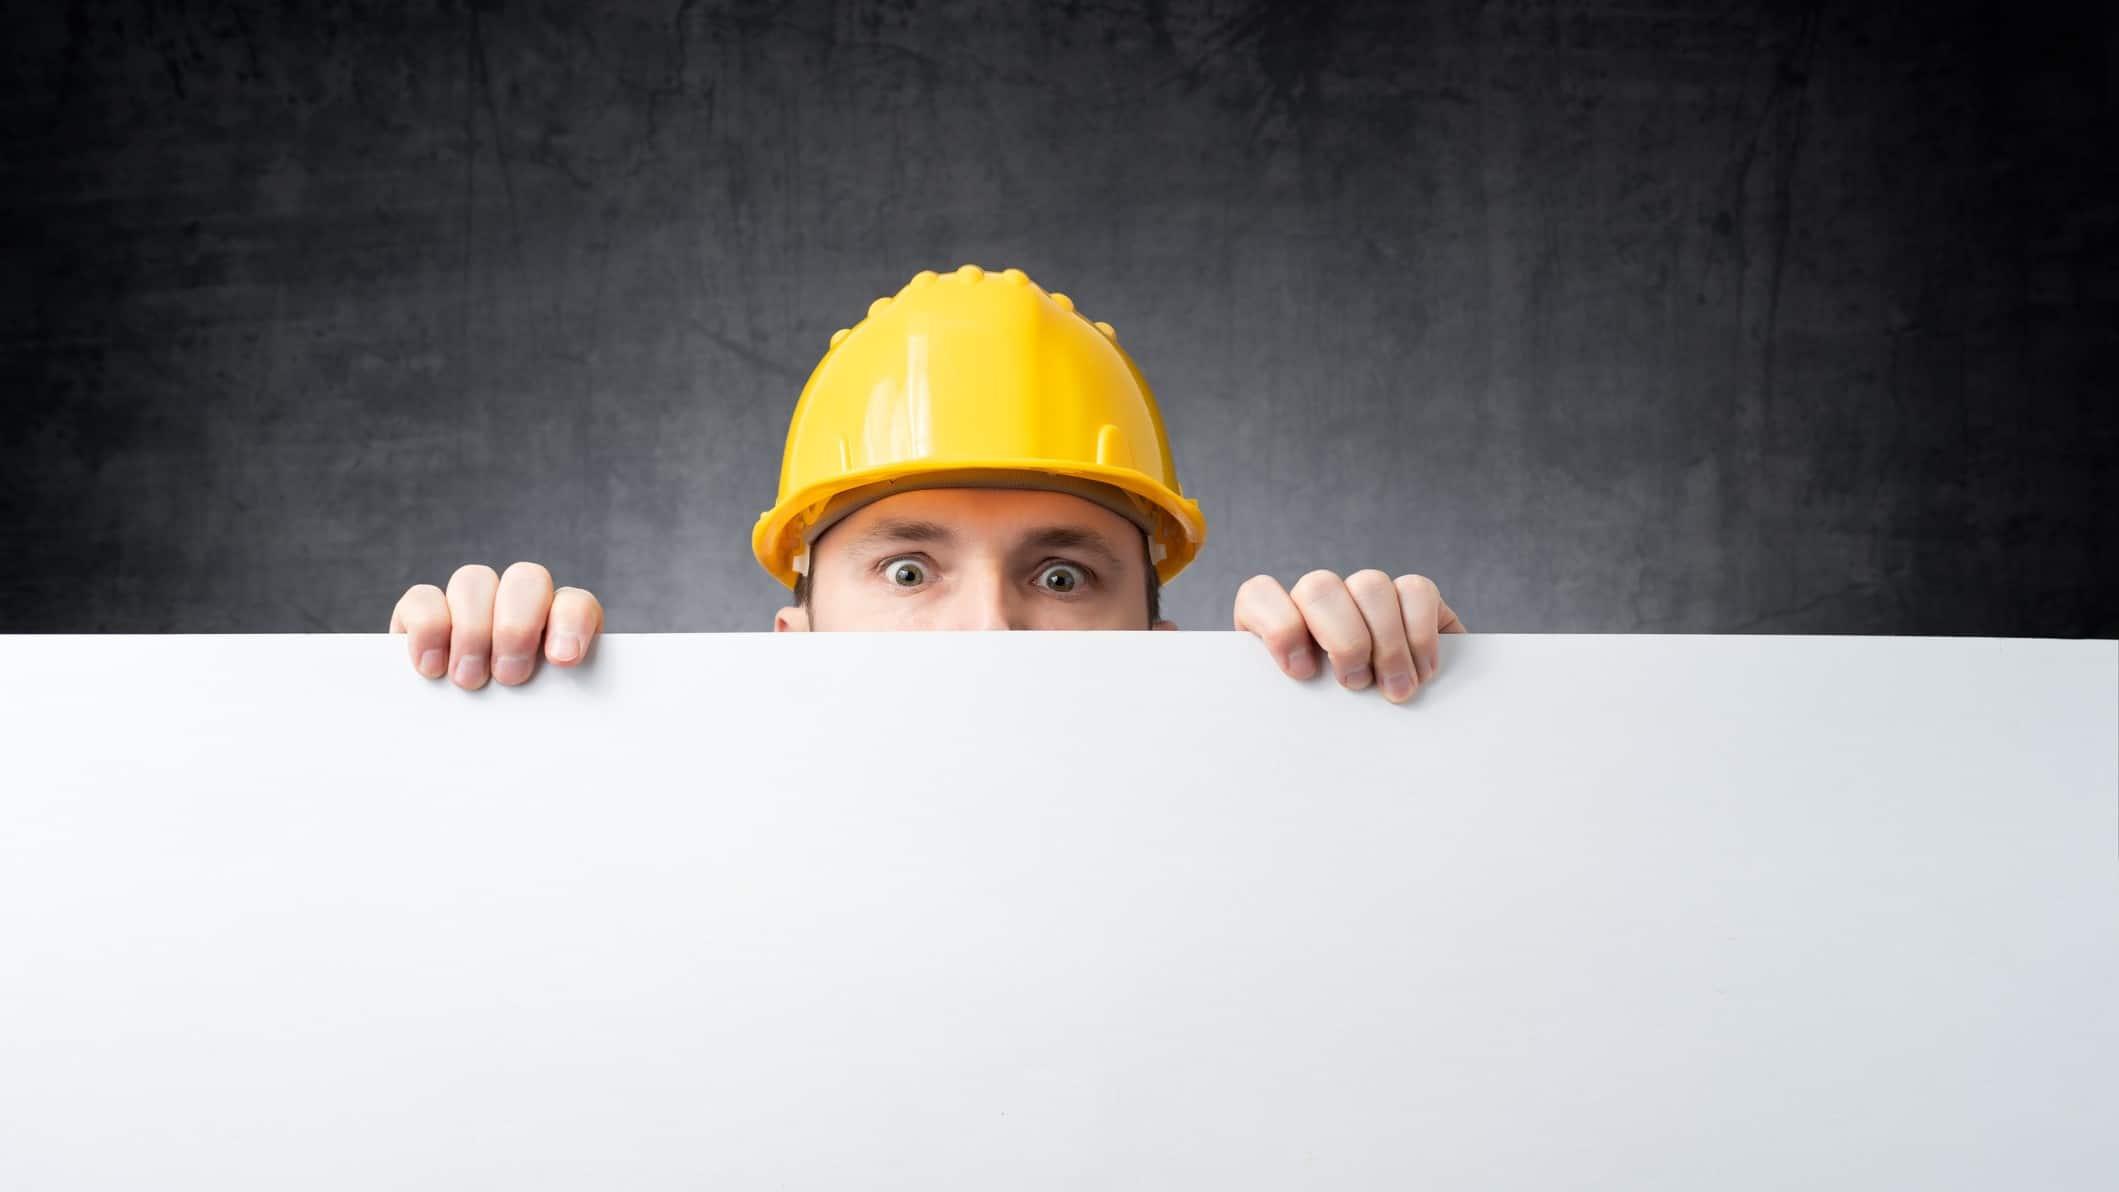 builder peeking over board as if watching asx share price